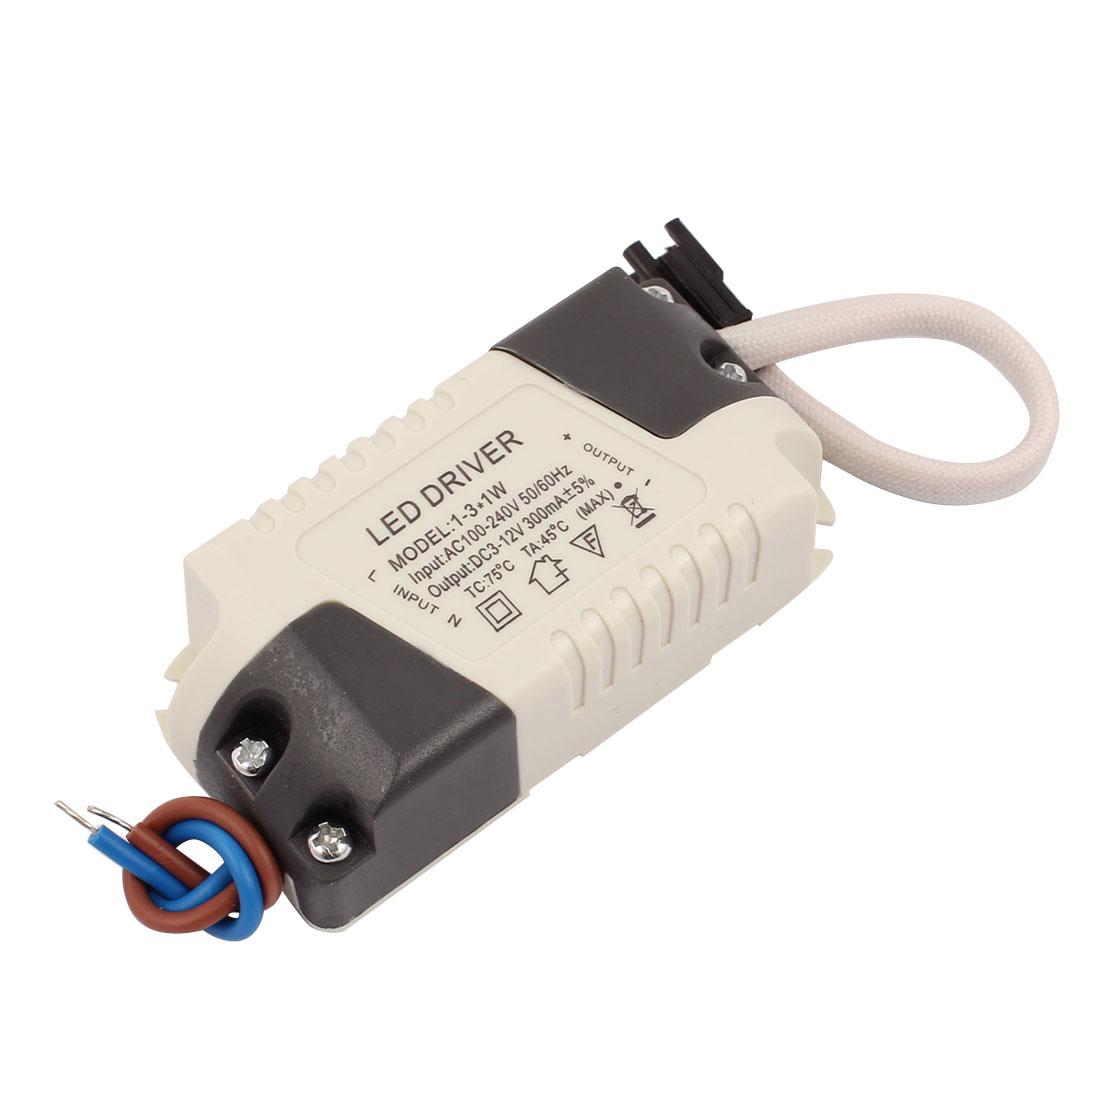 AC 85-265V DC -4V 300mA 1x3W LED Driver Power Supply Transformer Converter